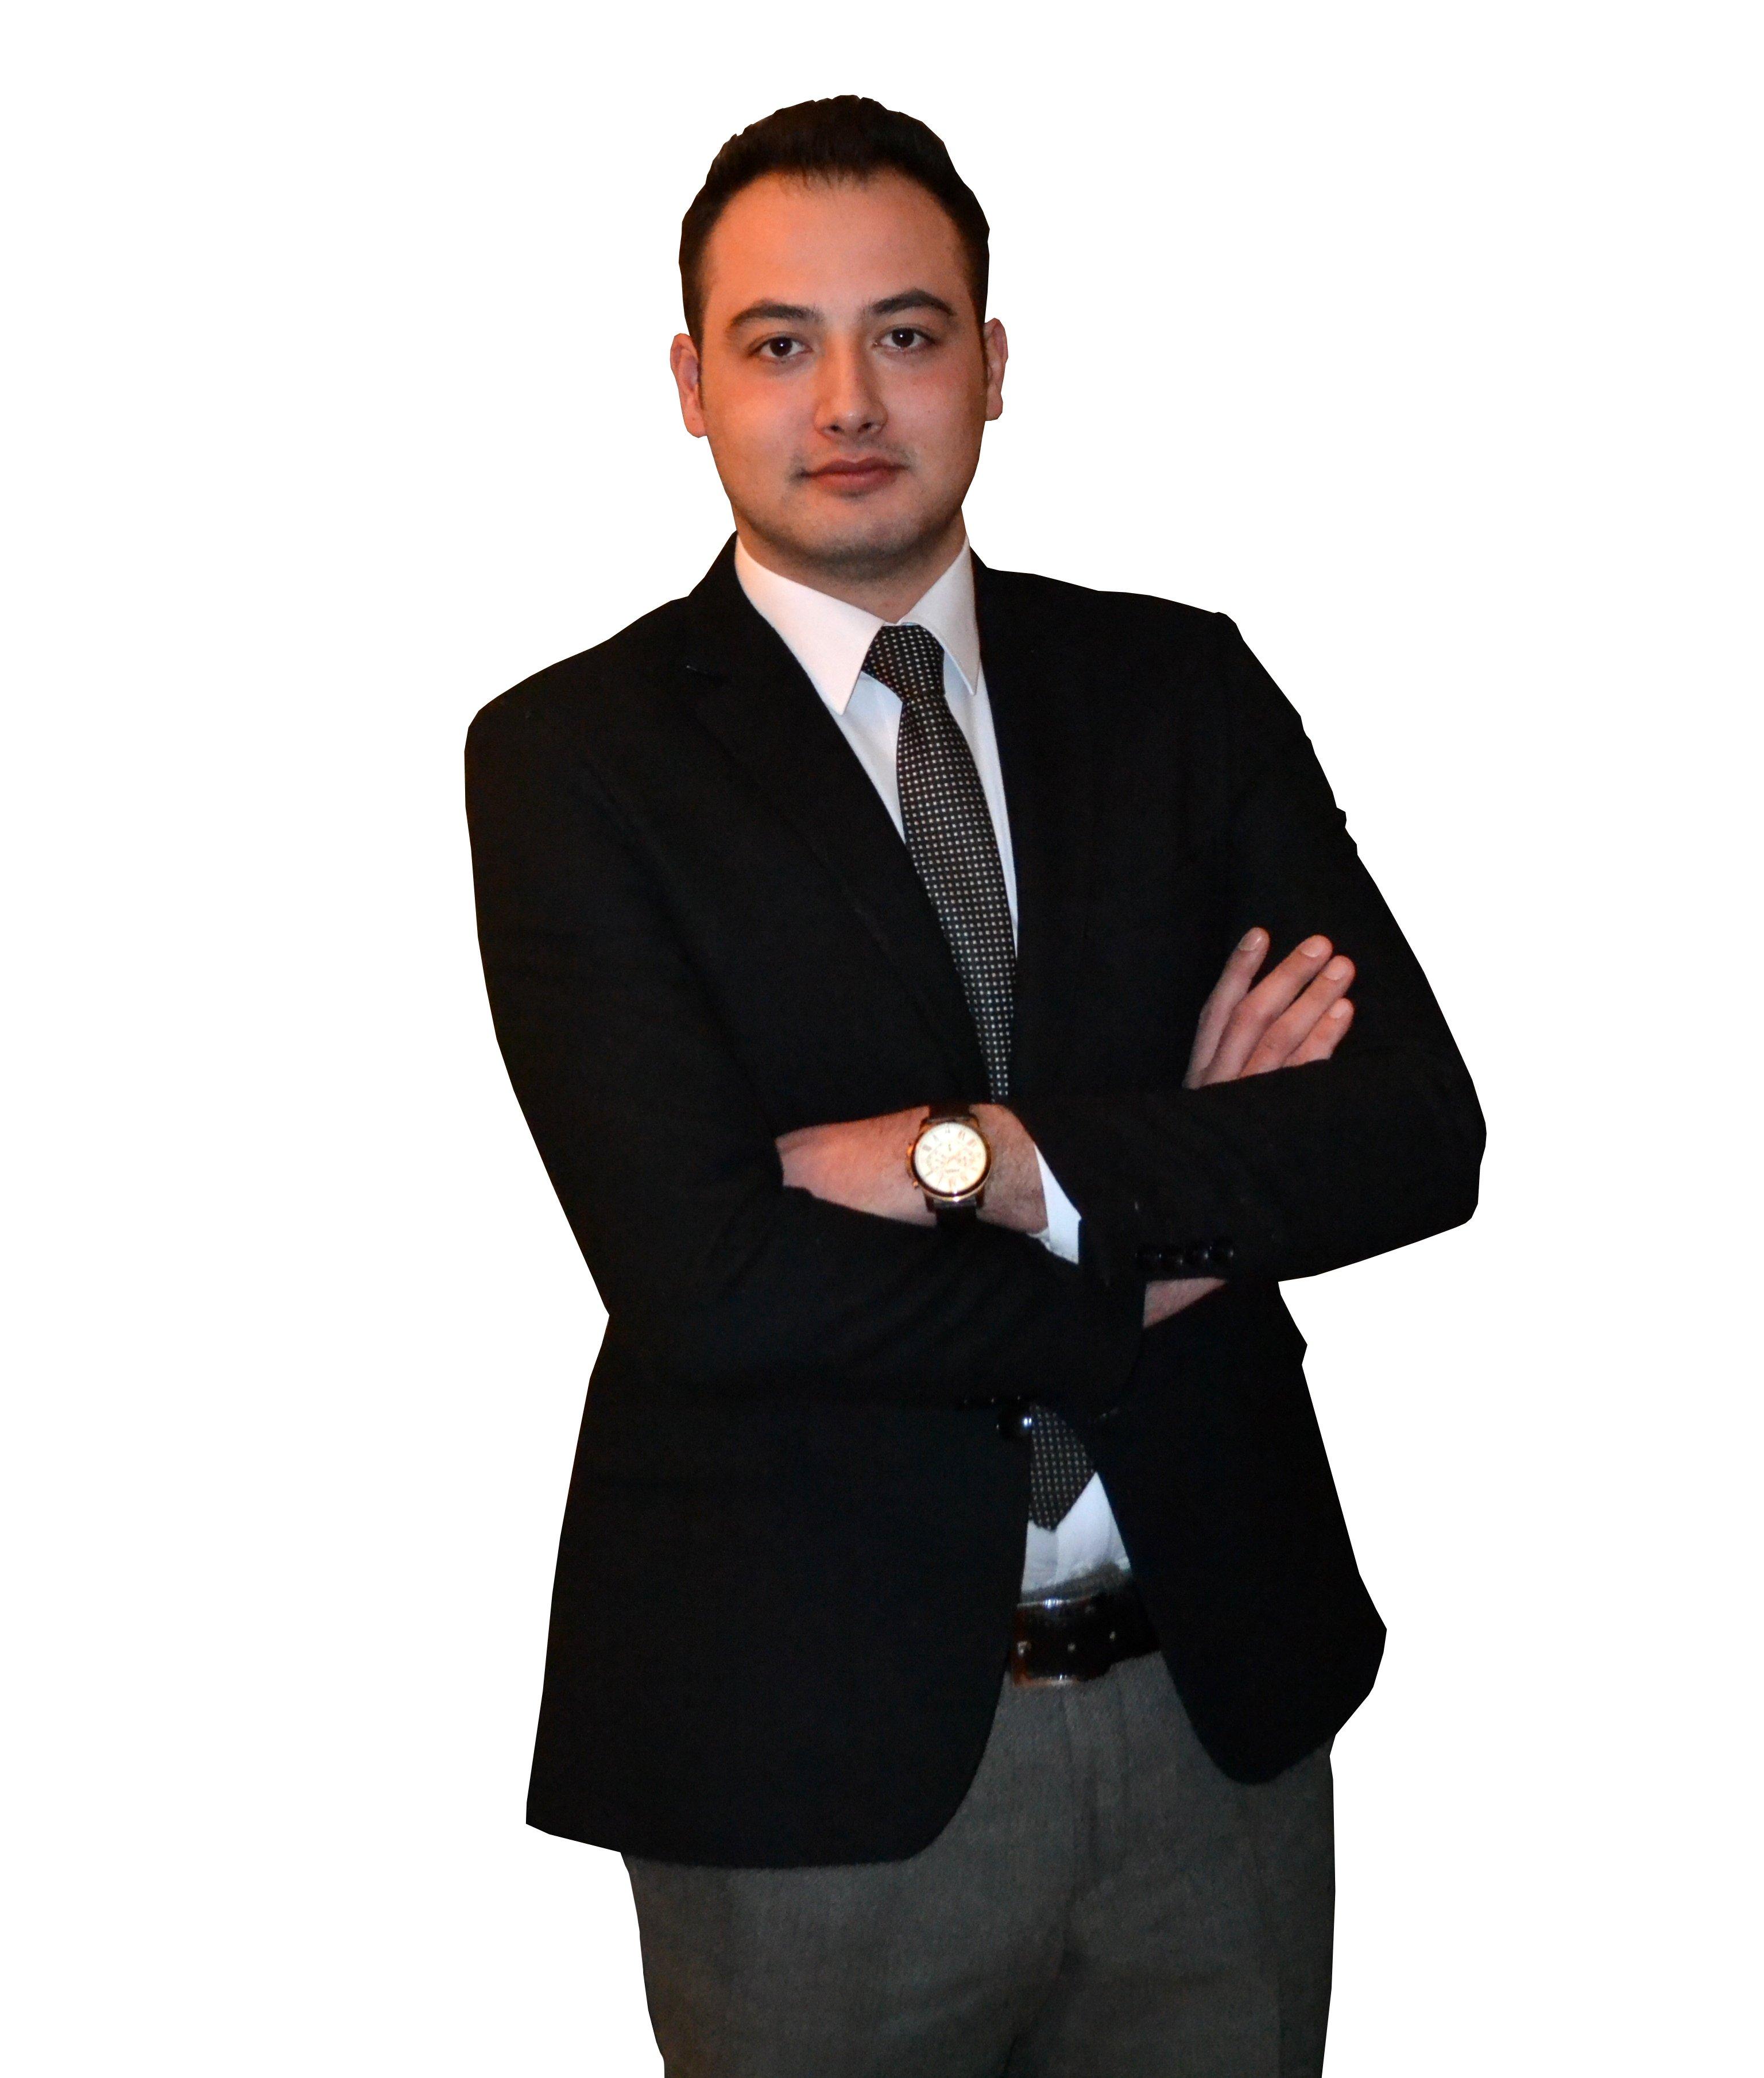 Sivas Avukat Mehmet Sezer Yılmaz